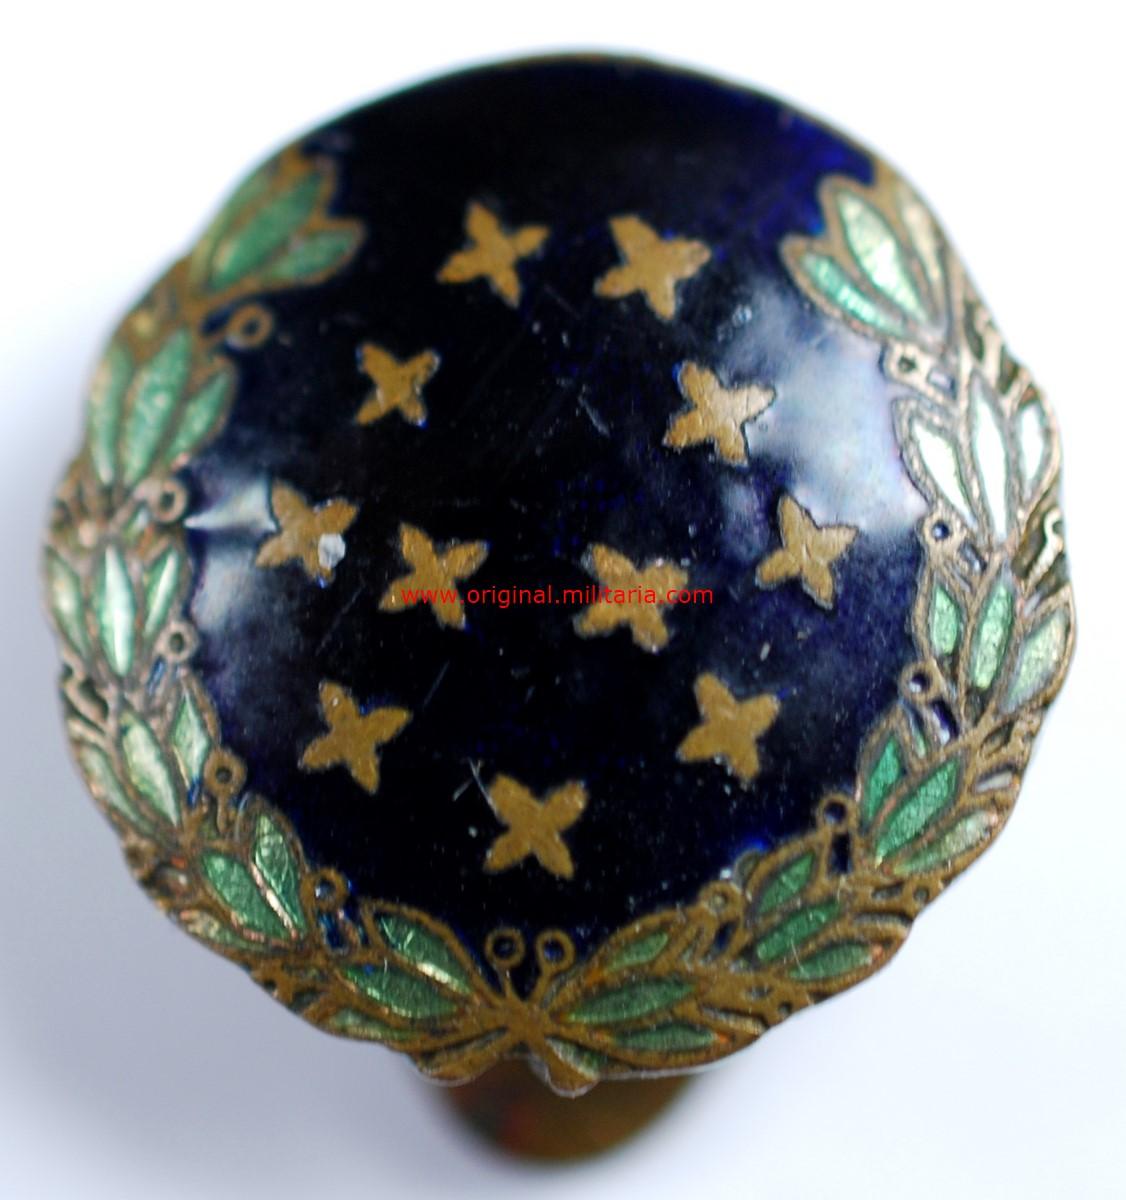 Miniatura de la Medalla de la Vieja Guardia